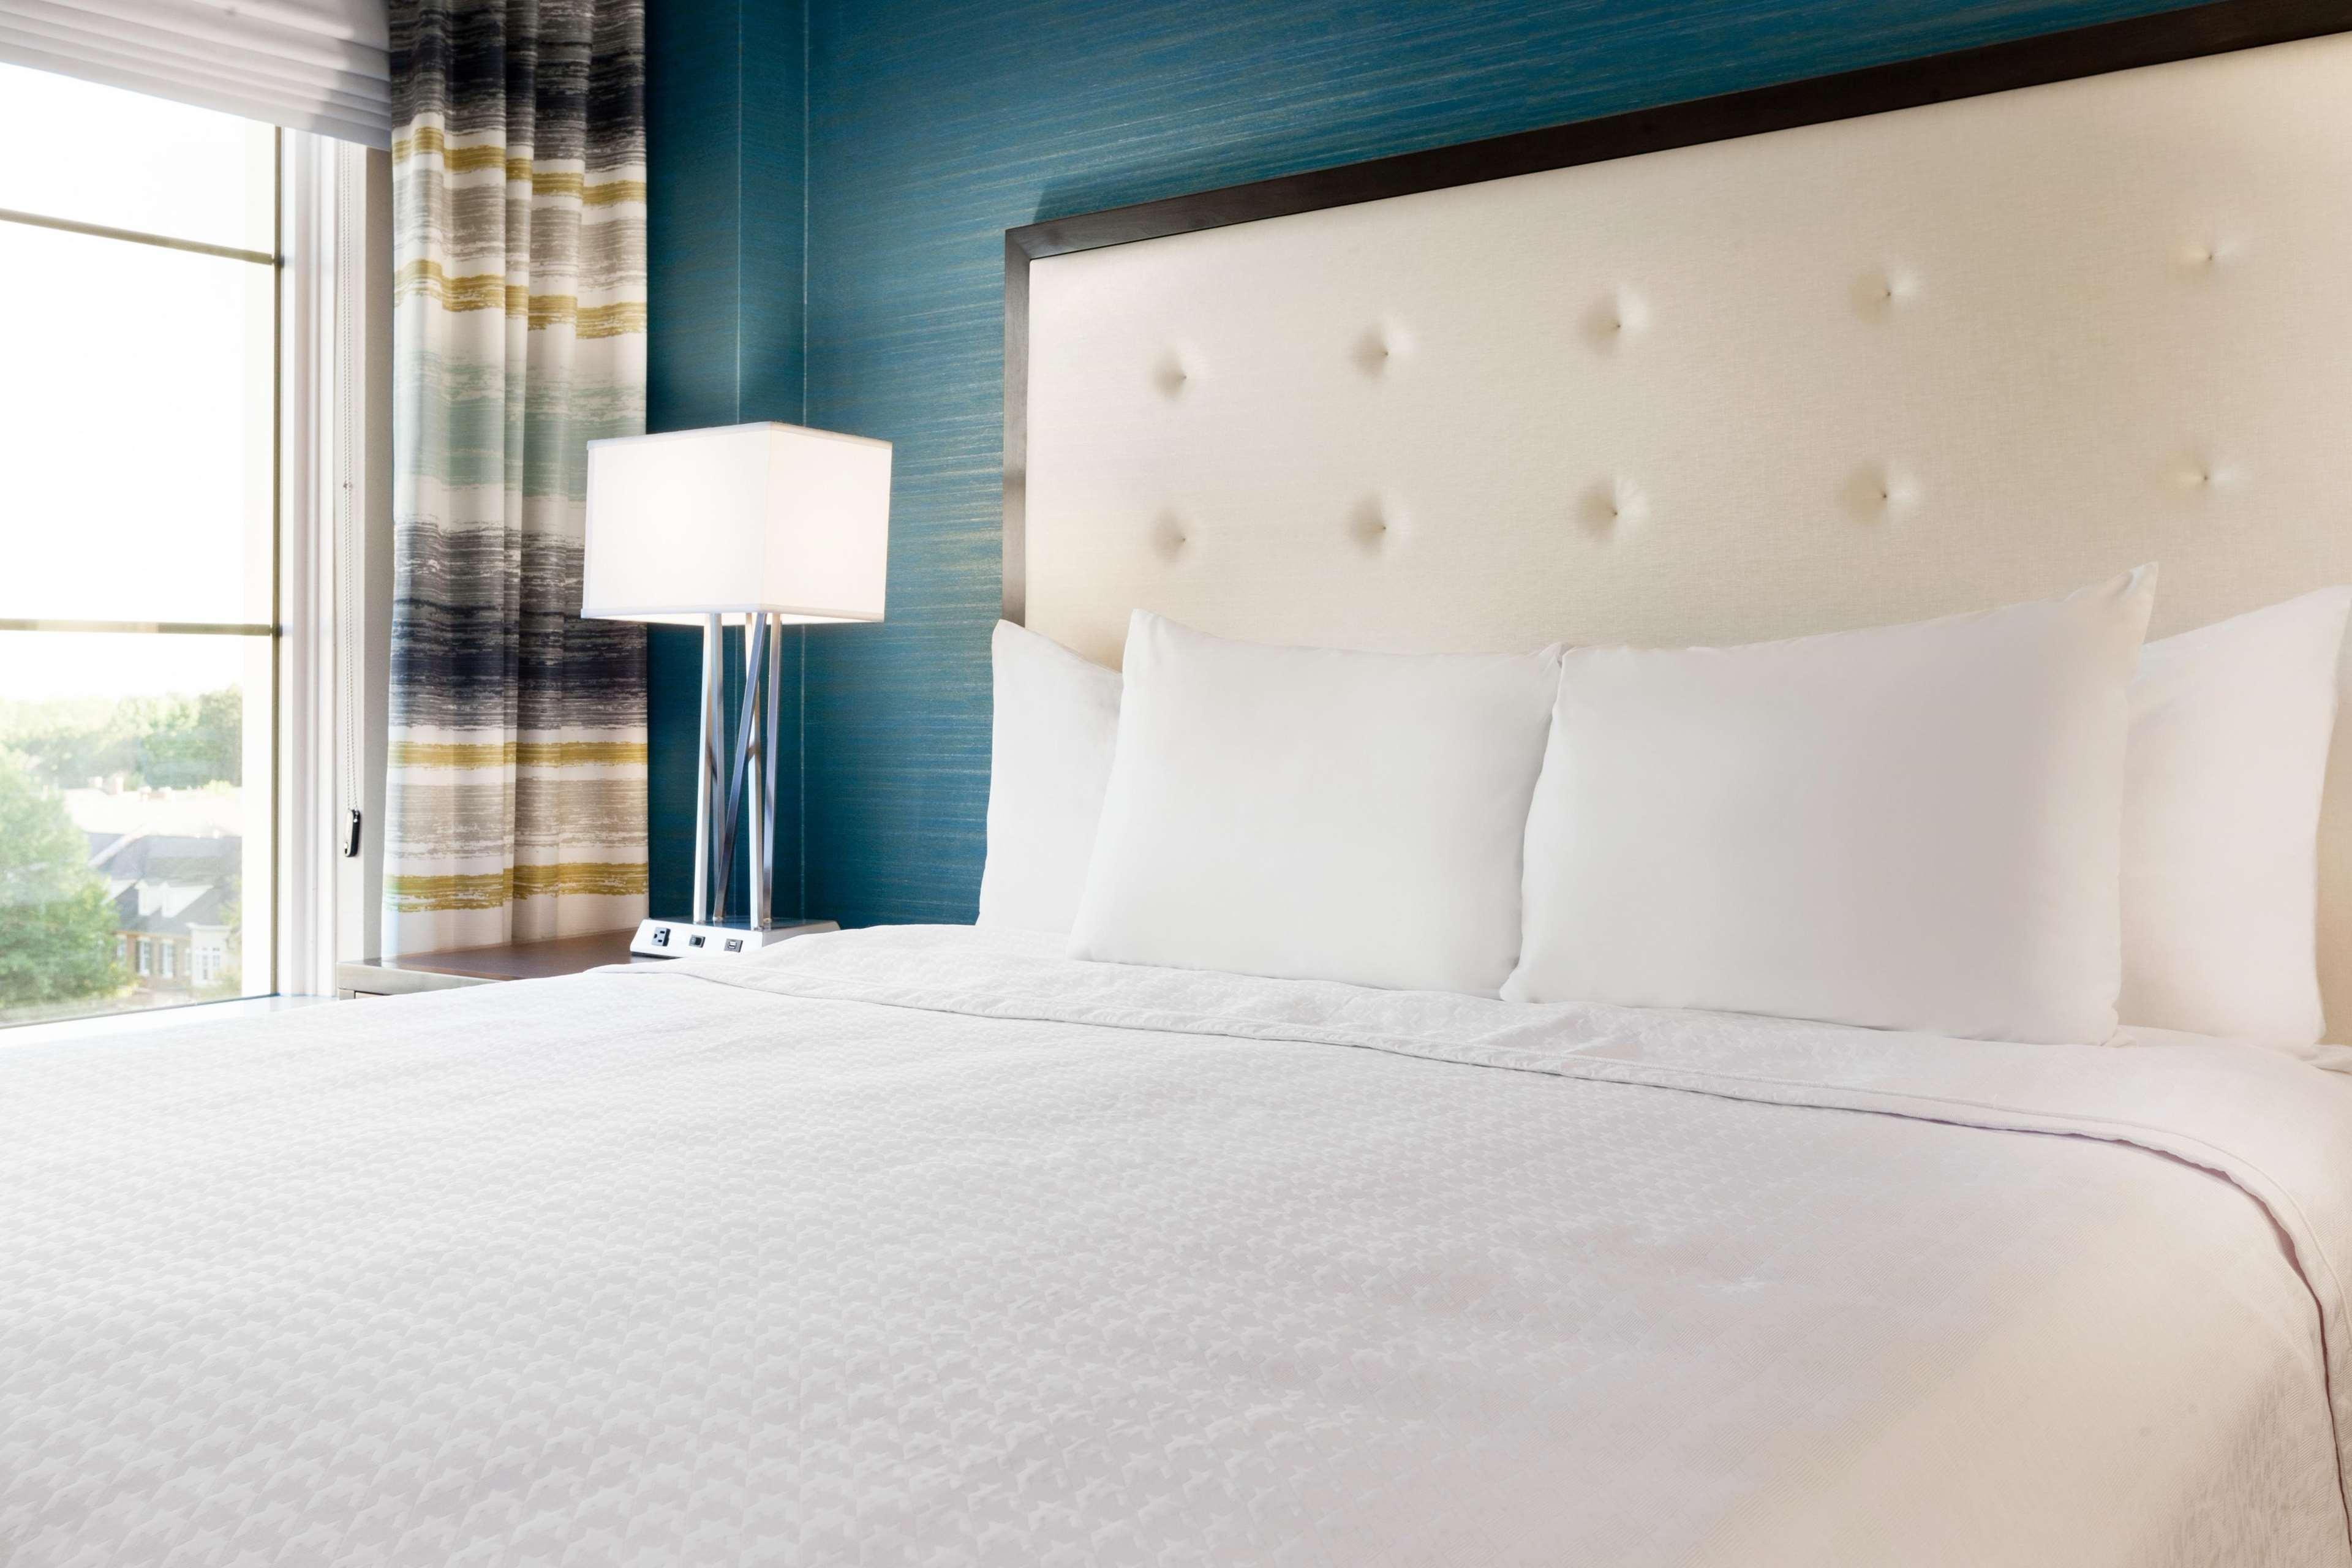 Homewood Suites by Hilton Charlotte/SouthPark image 17